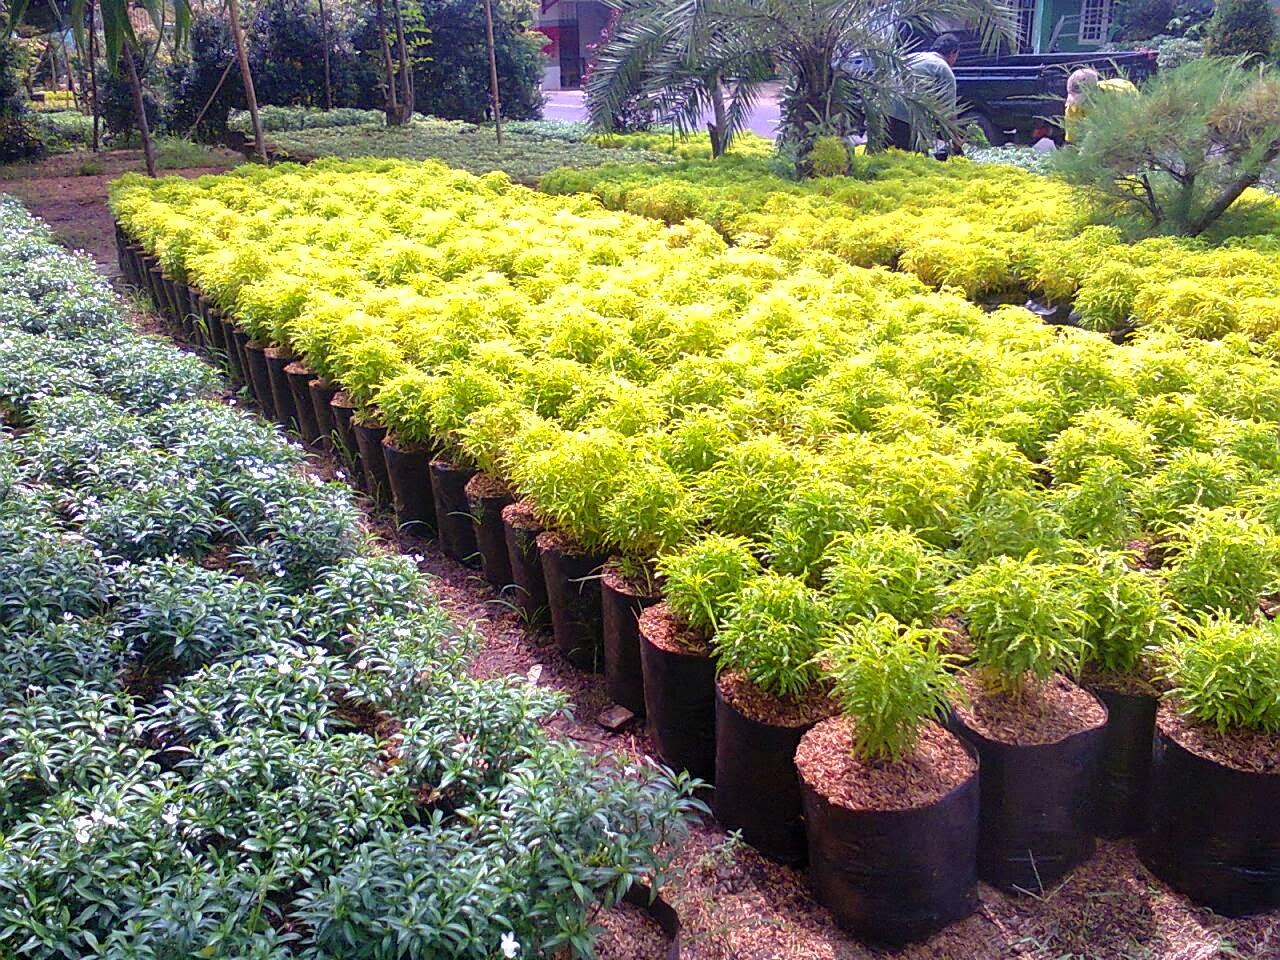 Jual Tanaman Hias Tukang Taman Jakarta Depok Bogor Biji Rumput